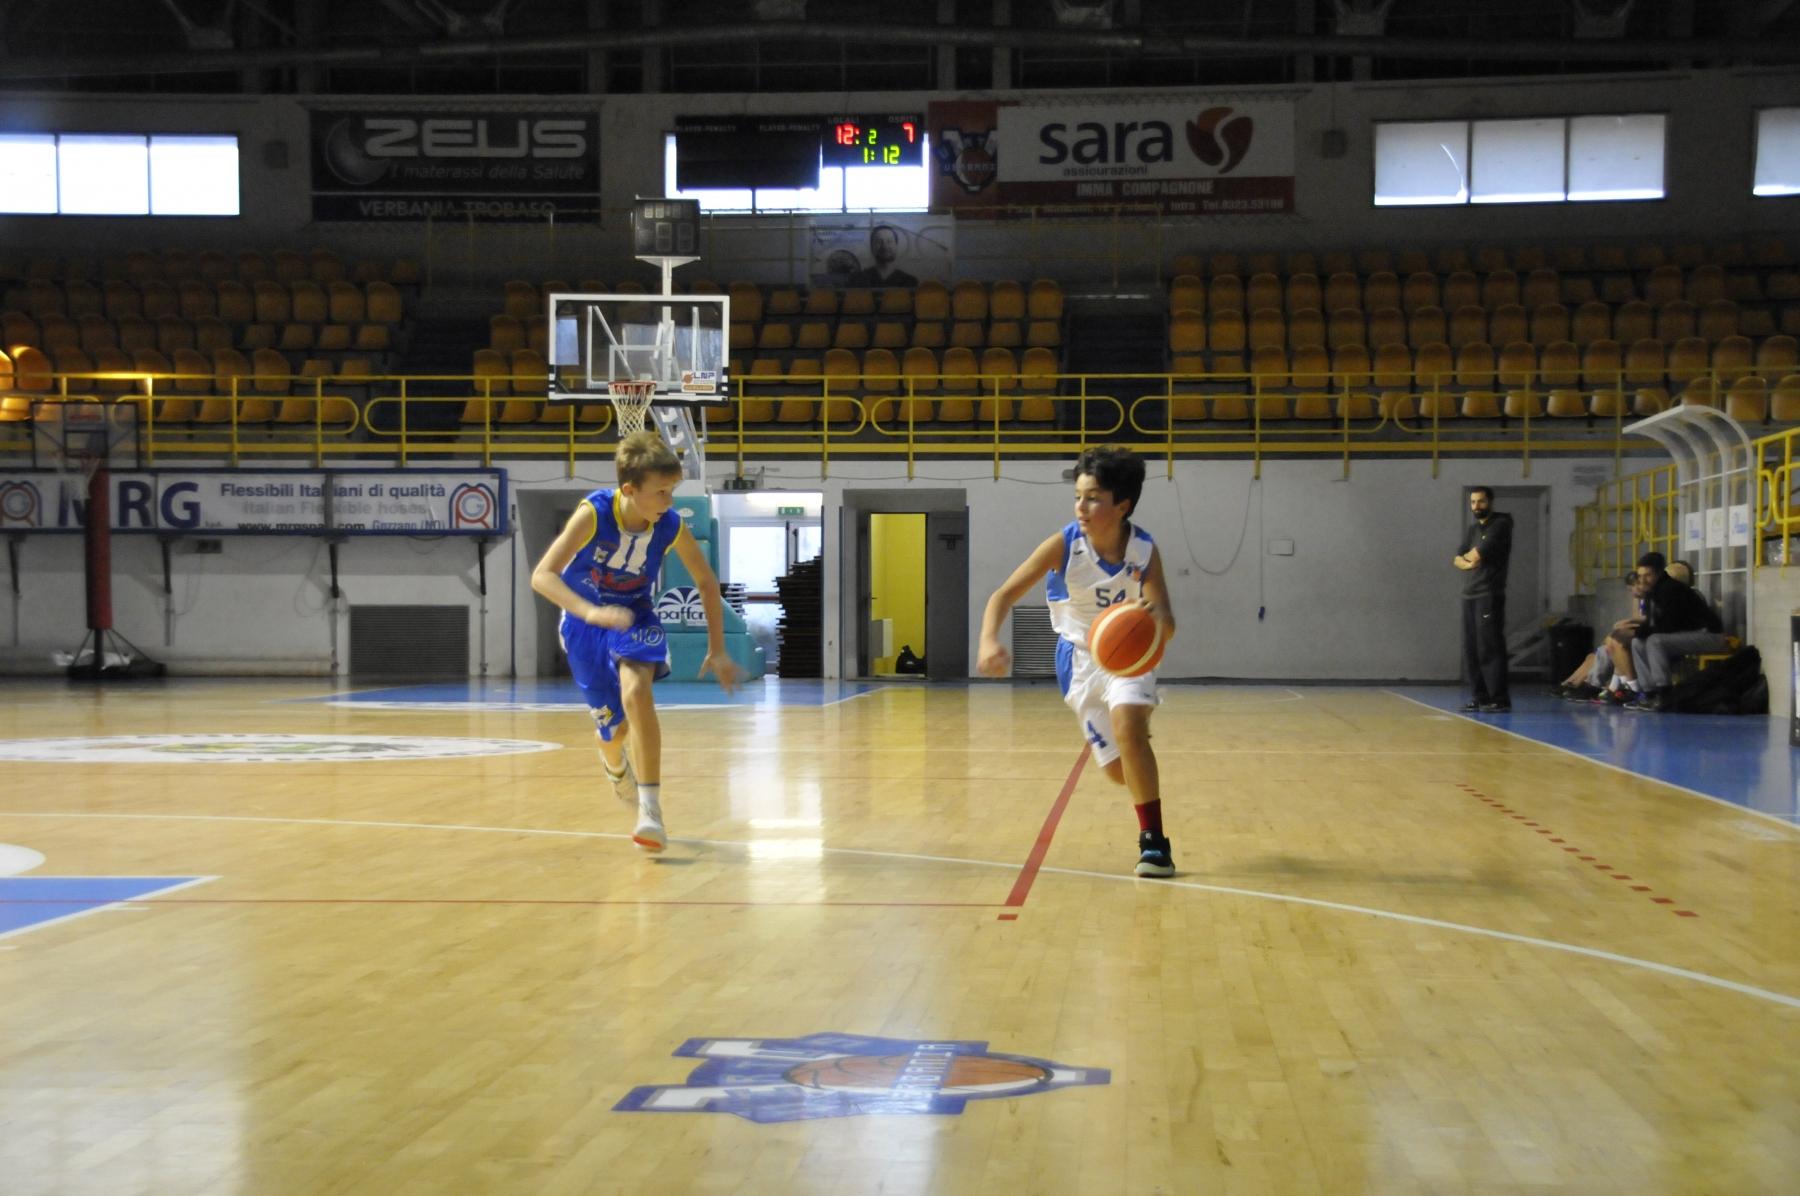 Virtus-Robur-Varese-U13-2019-12-21_027